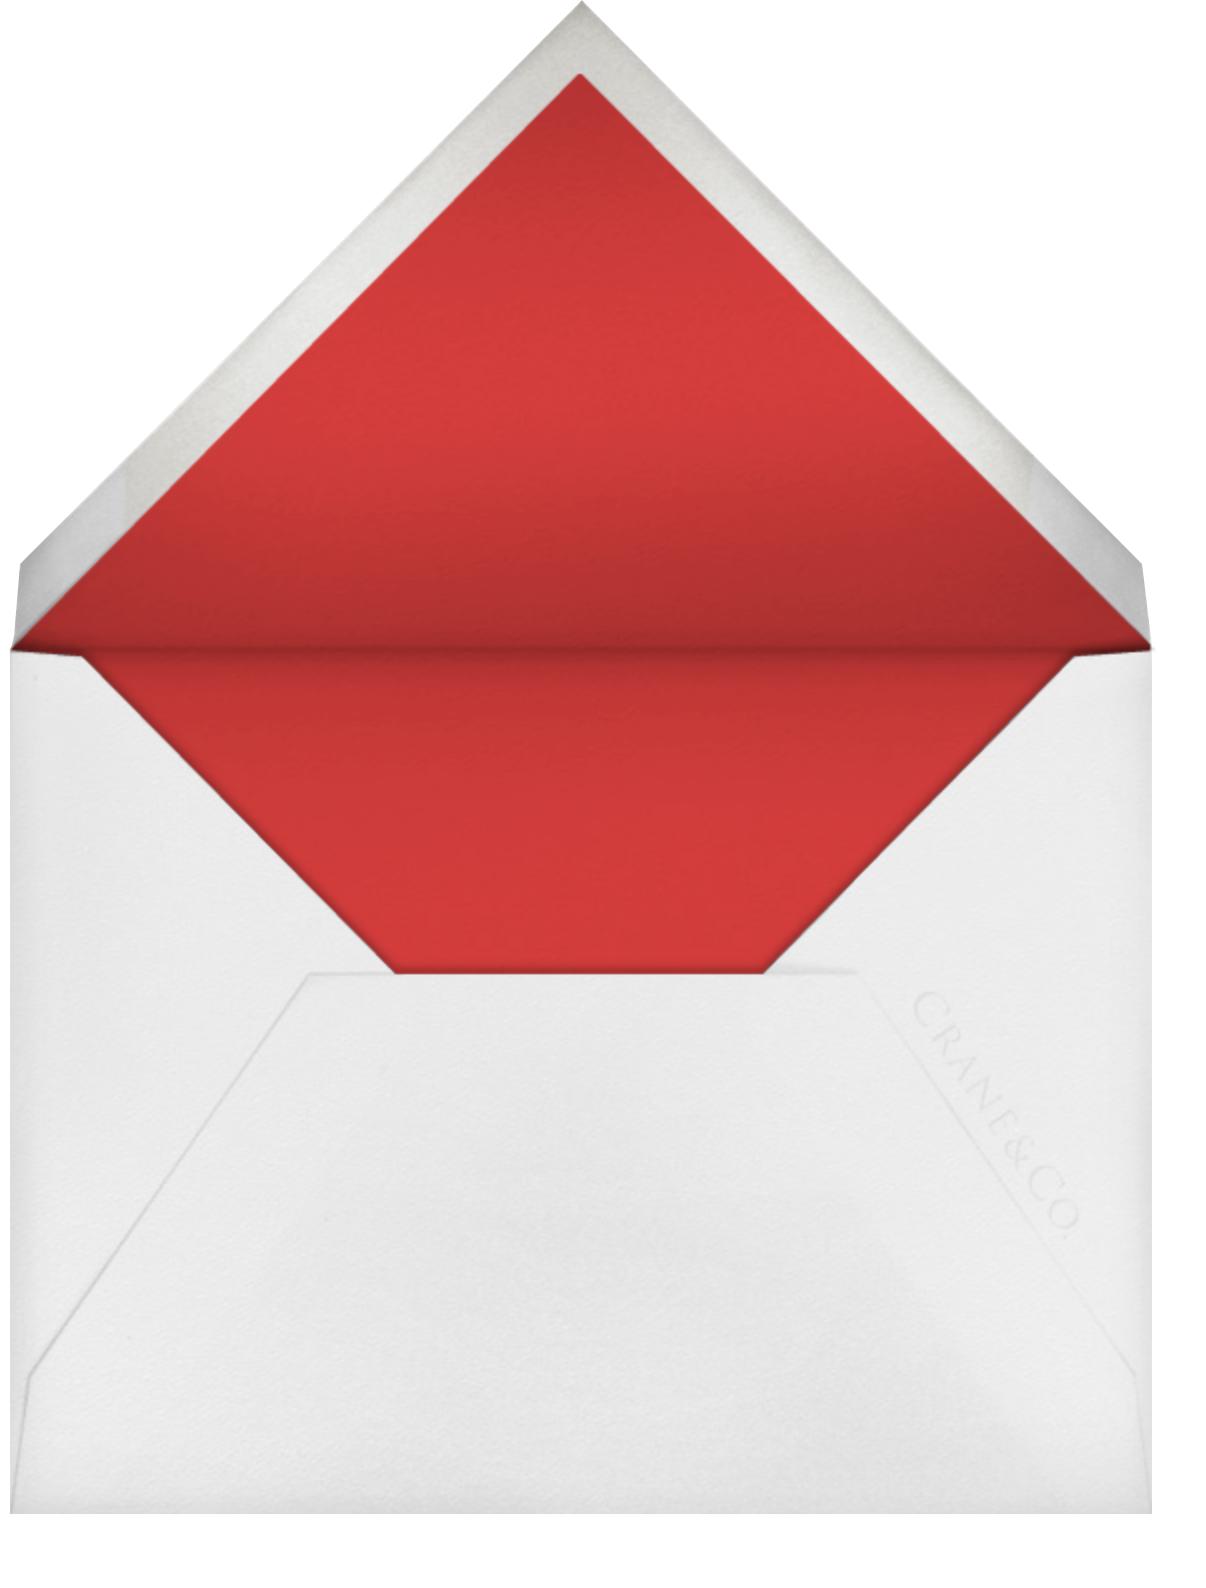 Kerala I (Thank You) - Gold - Paperless Post - Wedding stationery - envelope back